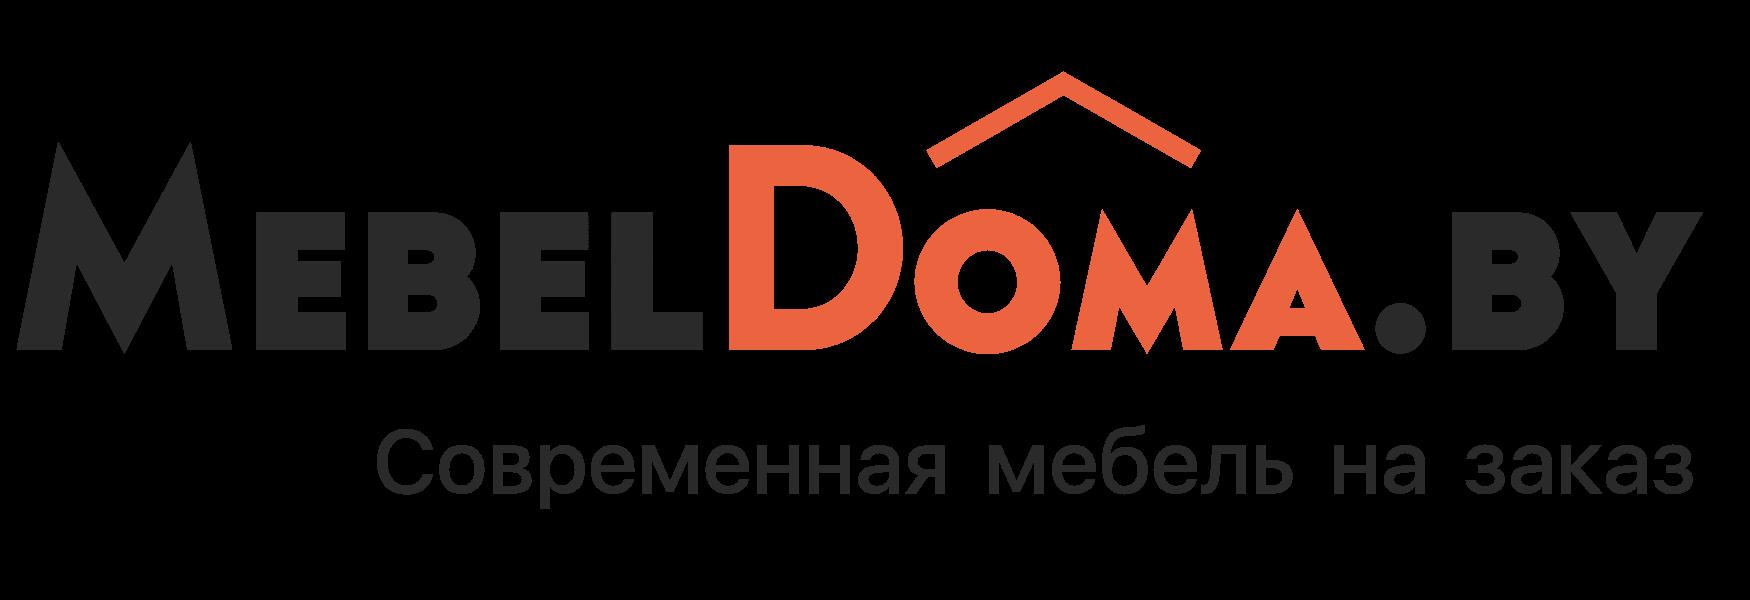 MebelDoma